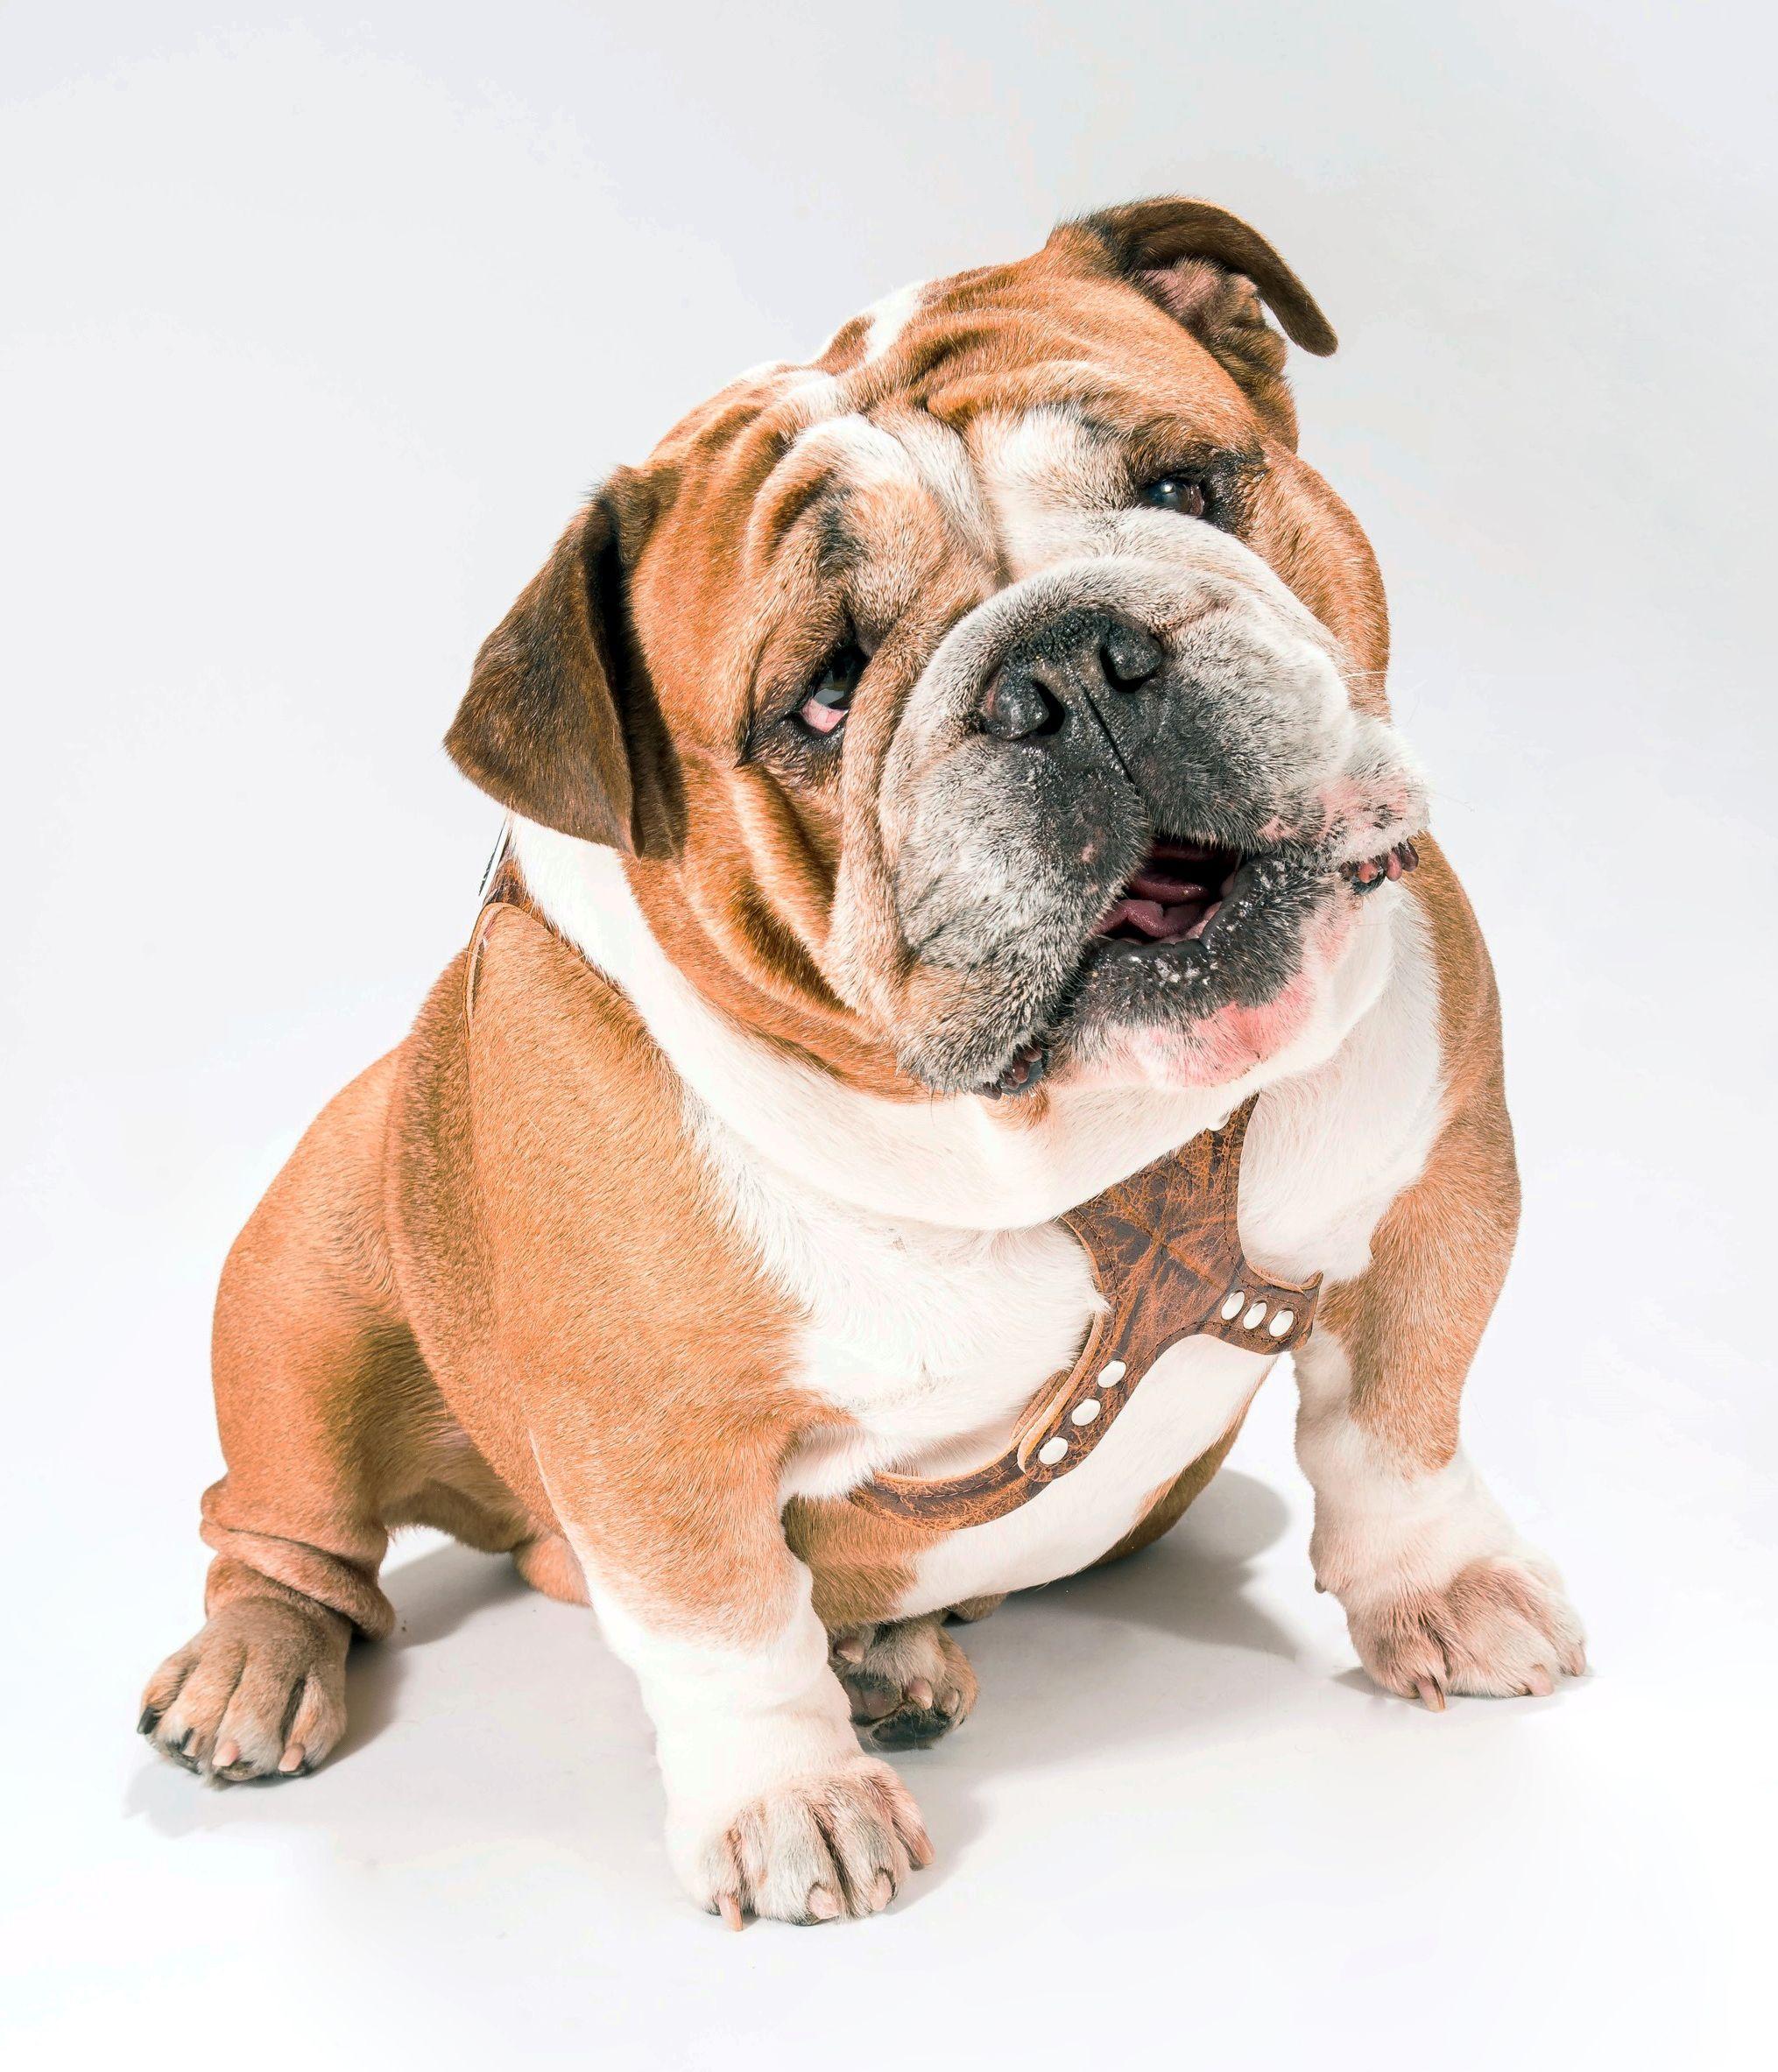 English Bulldog Chance Is Wearing A Bark Buddy Belt Dog Harness